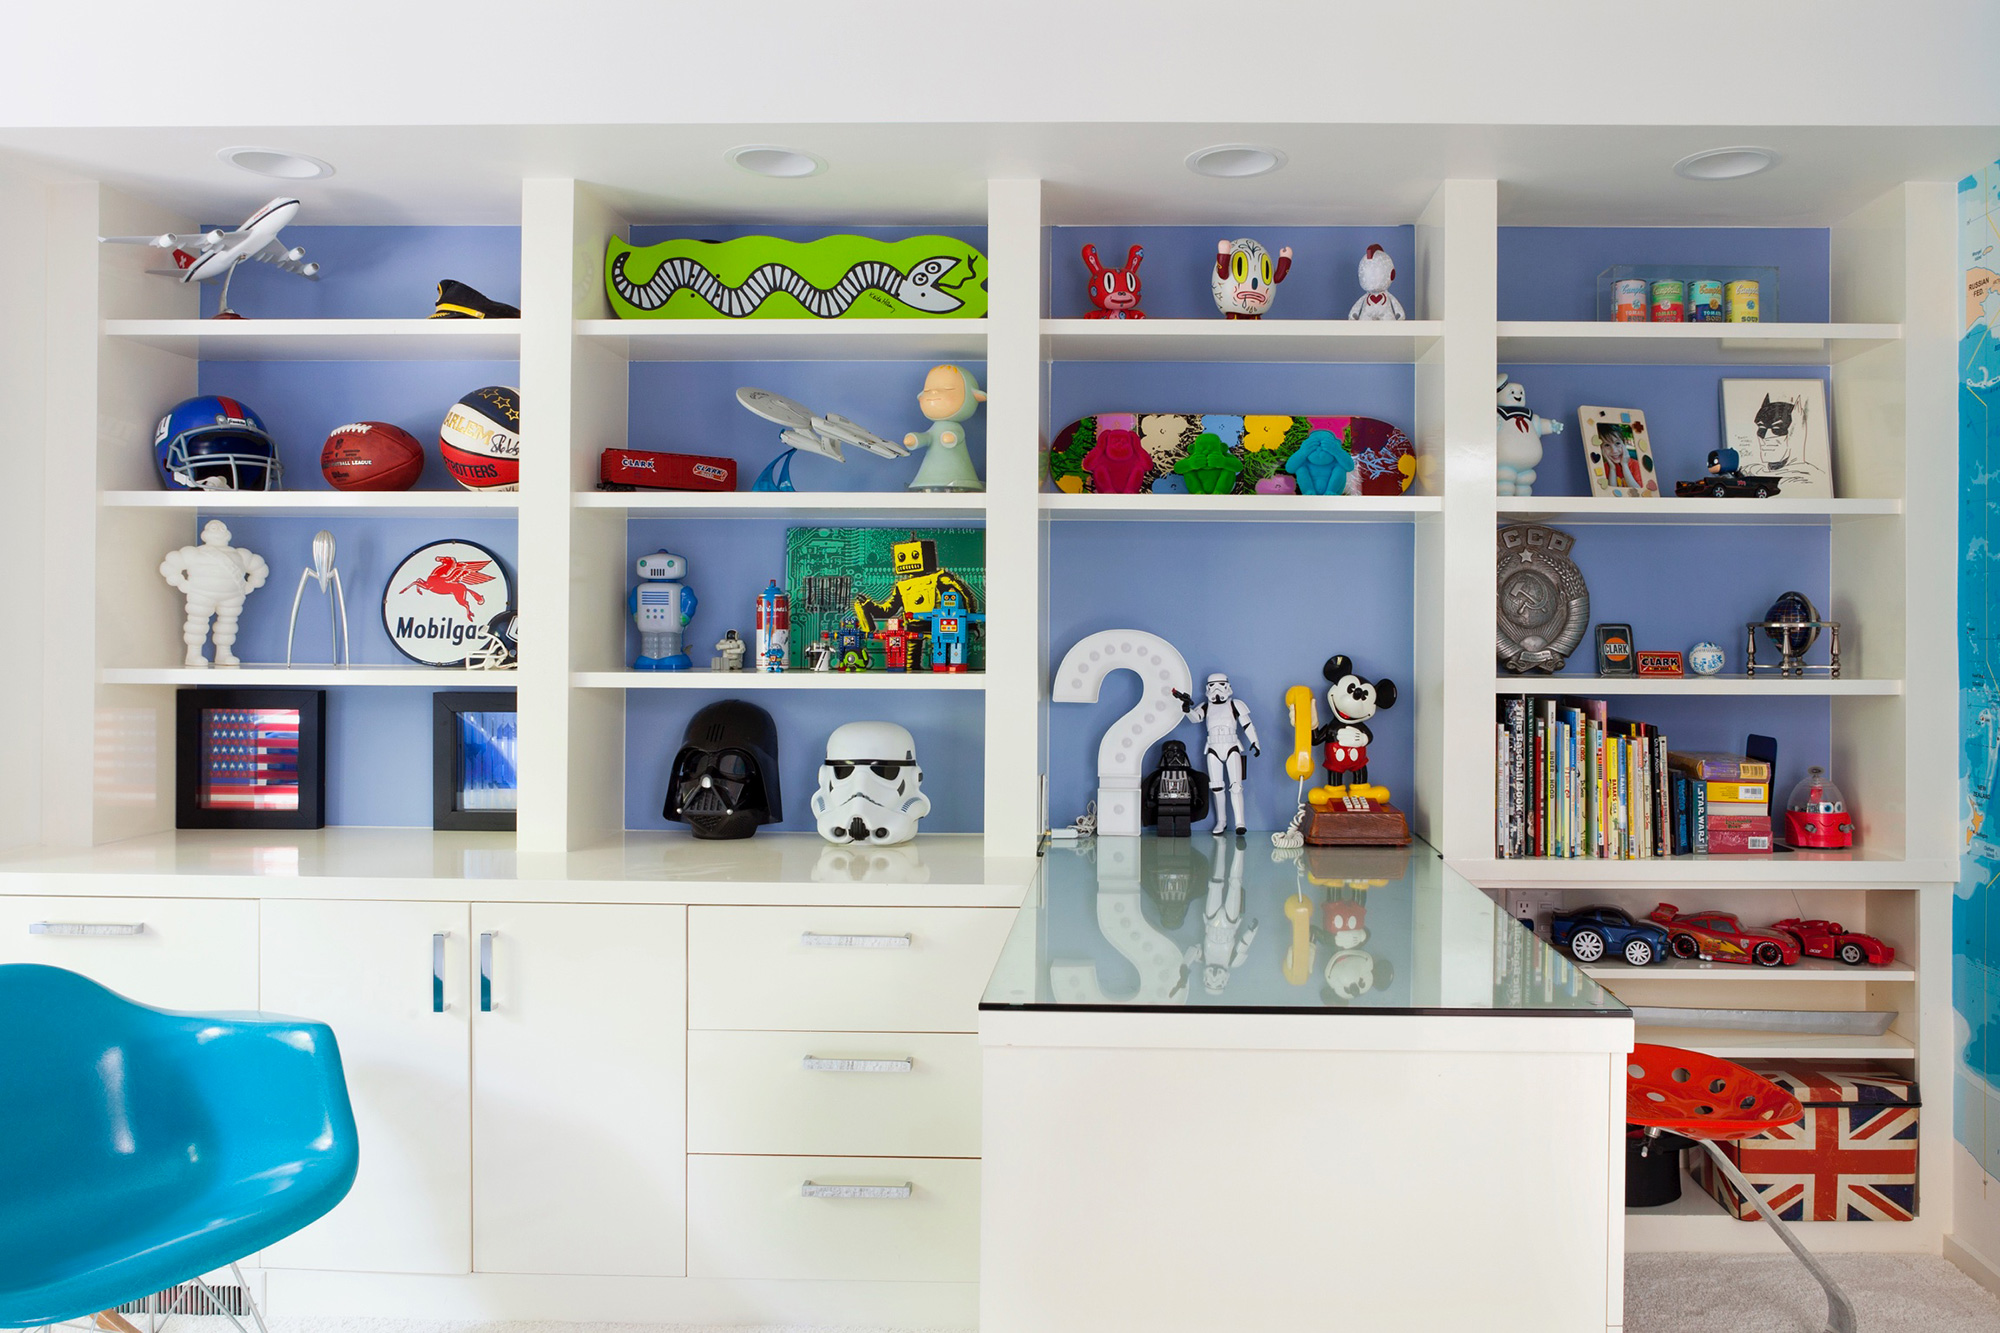 interiors-kids-are-people-new-7.jpg